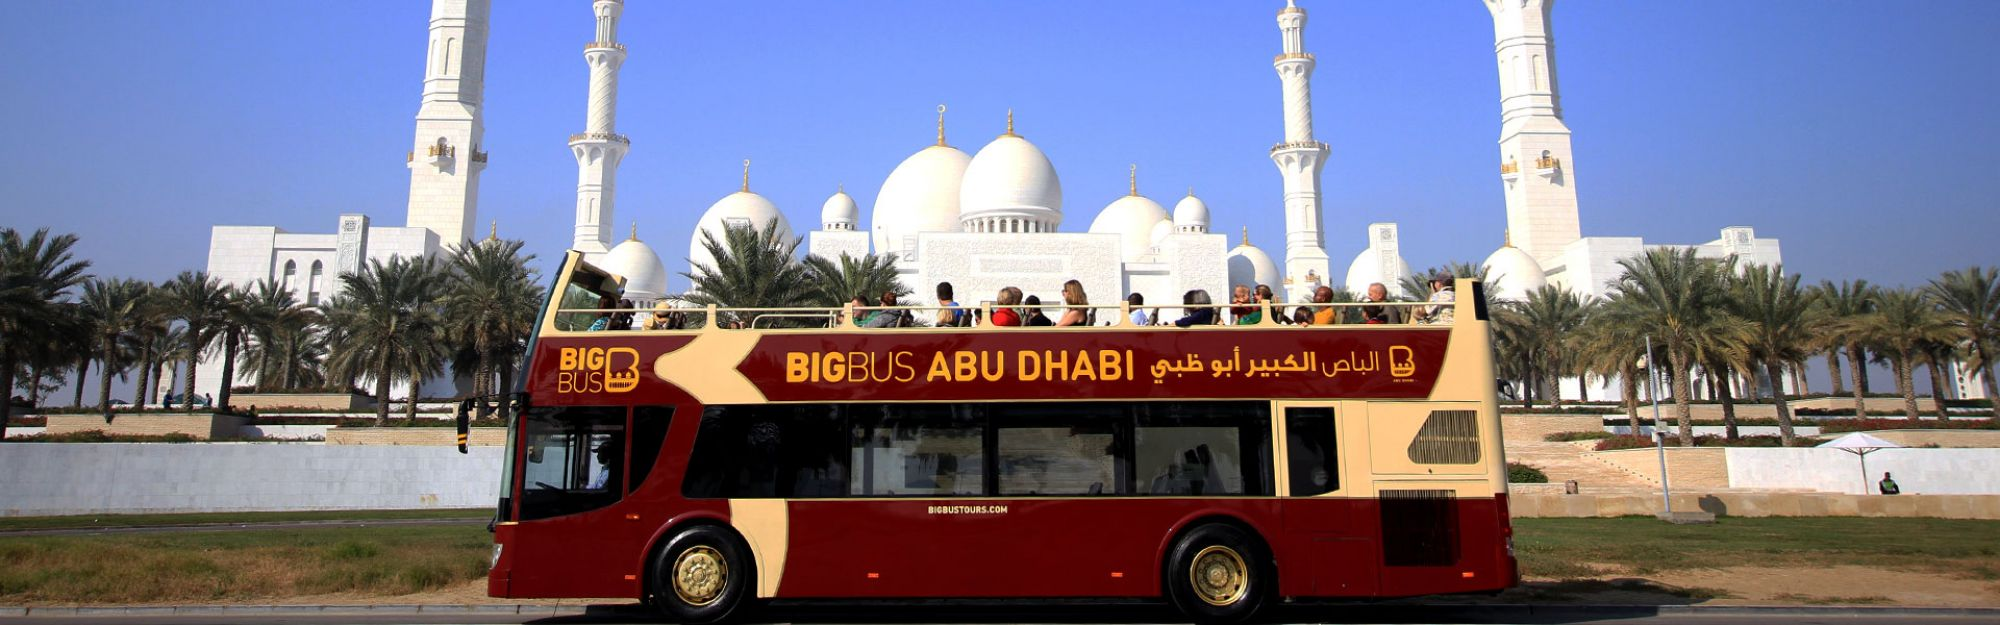 Abu Dhabi Classic-Ticket